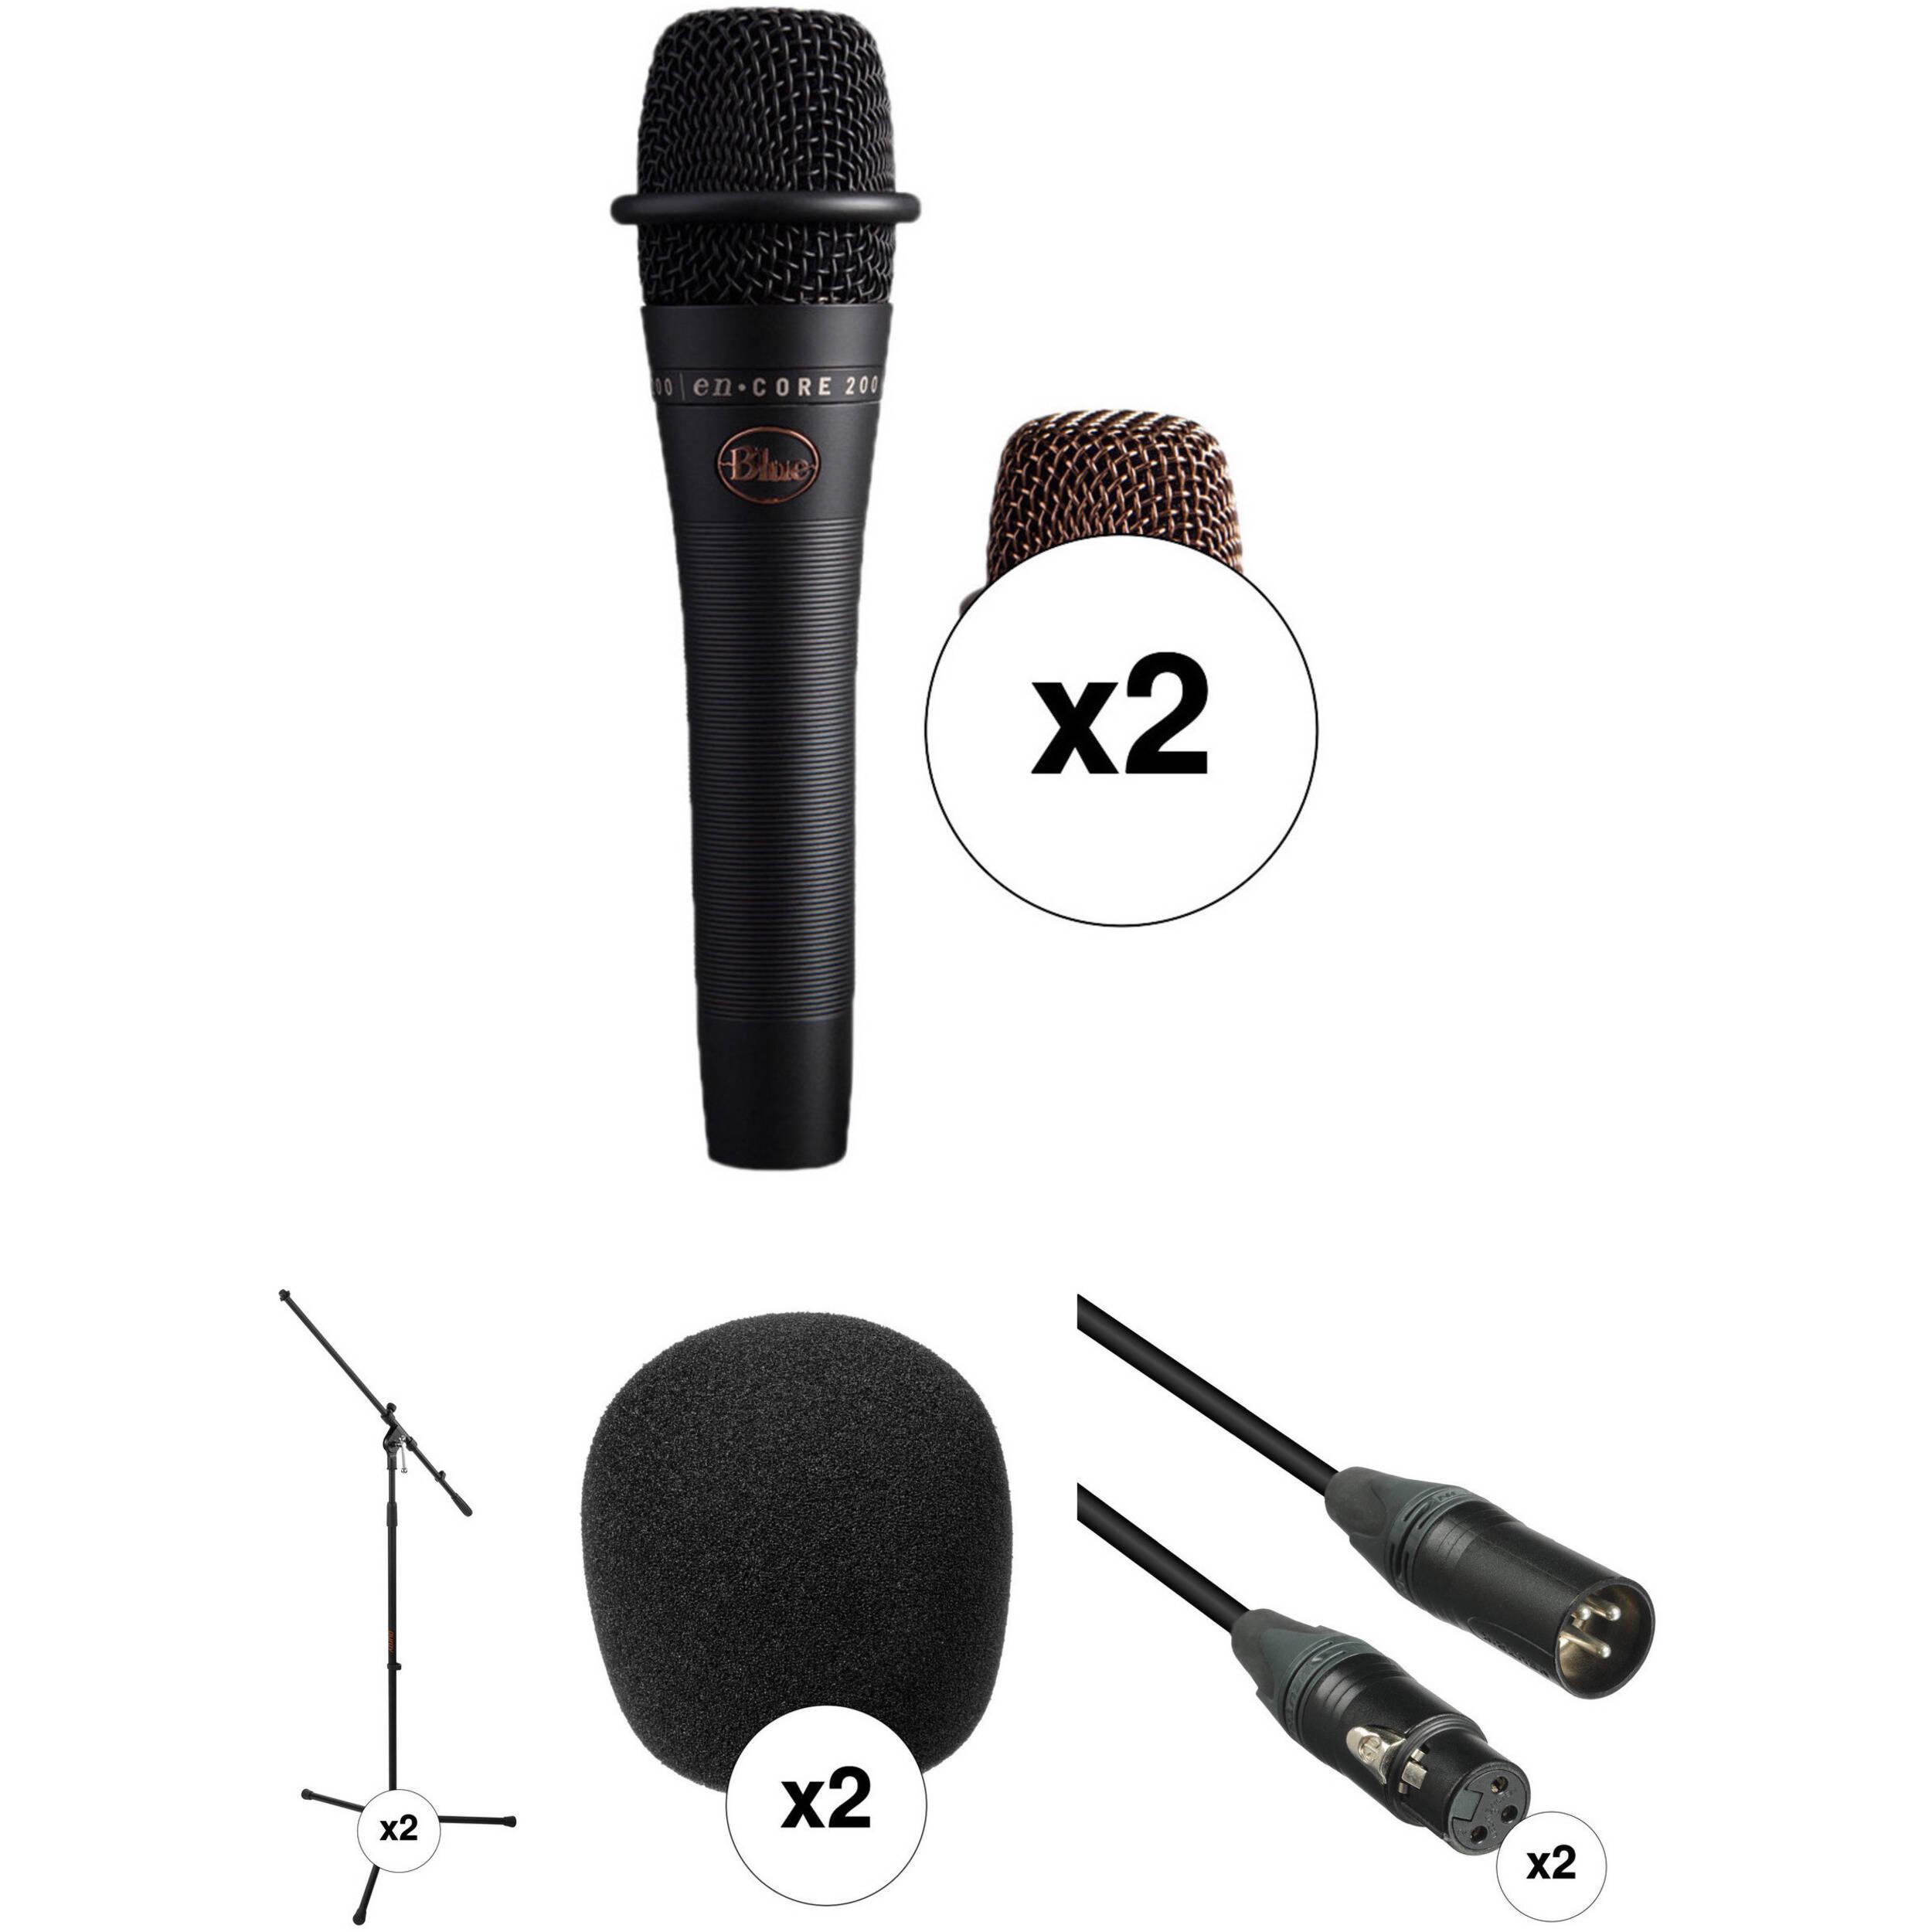 Blue Dual enCORE 200 Active Dynamic Handheld Vocal Microphones